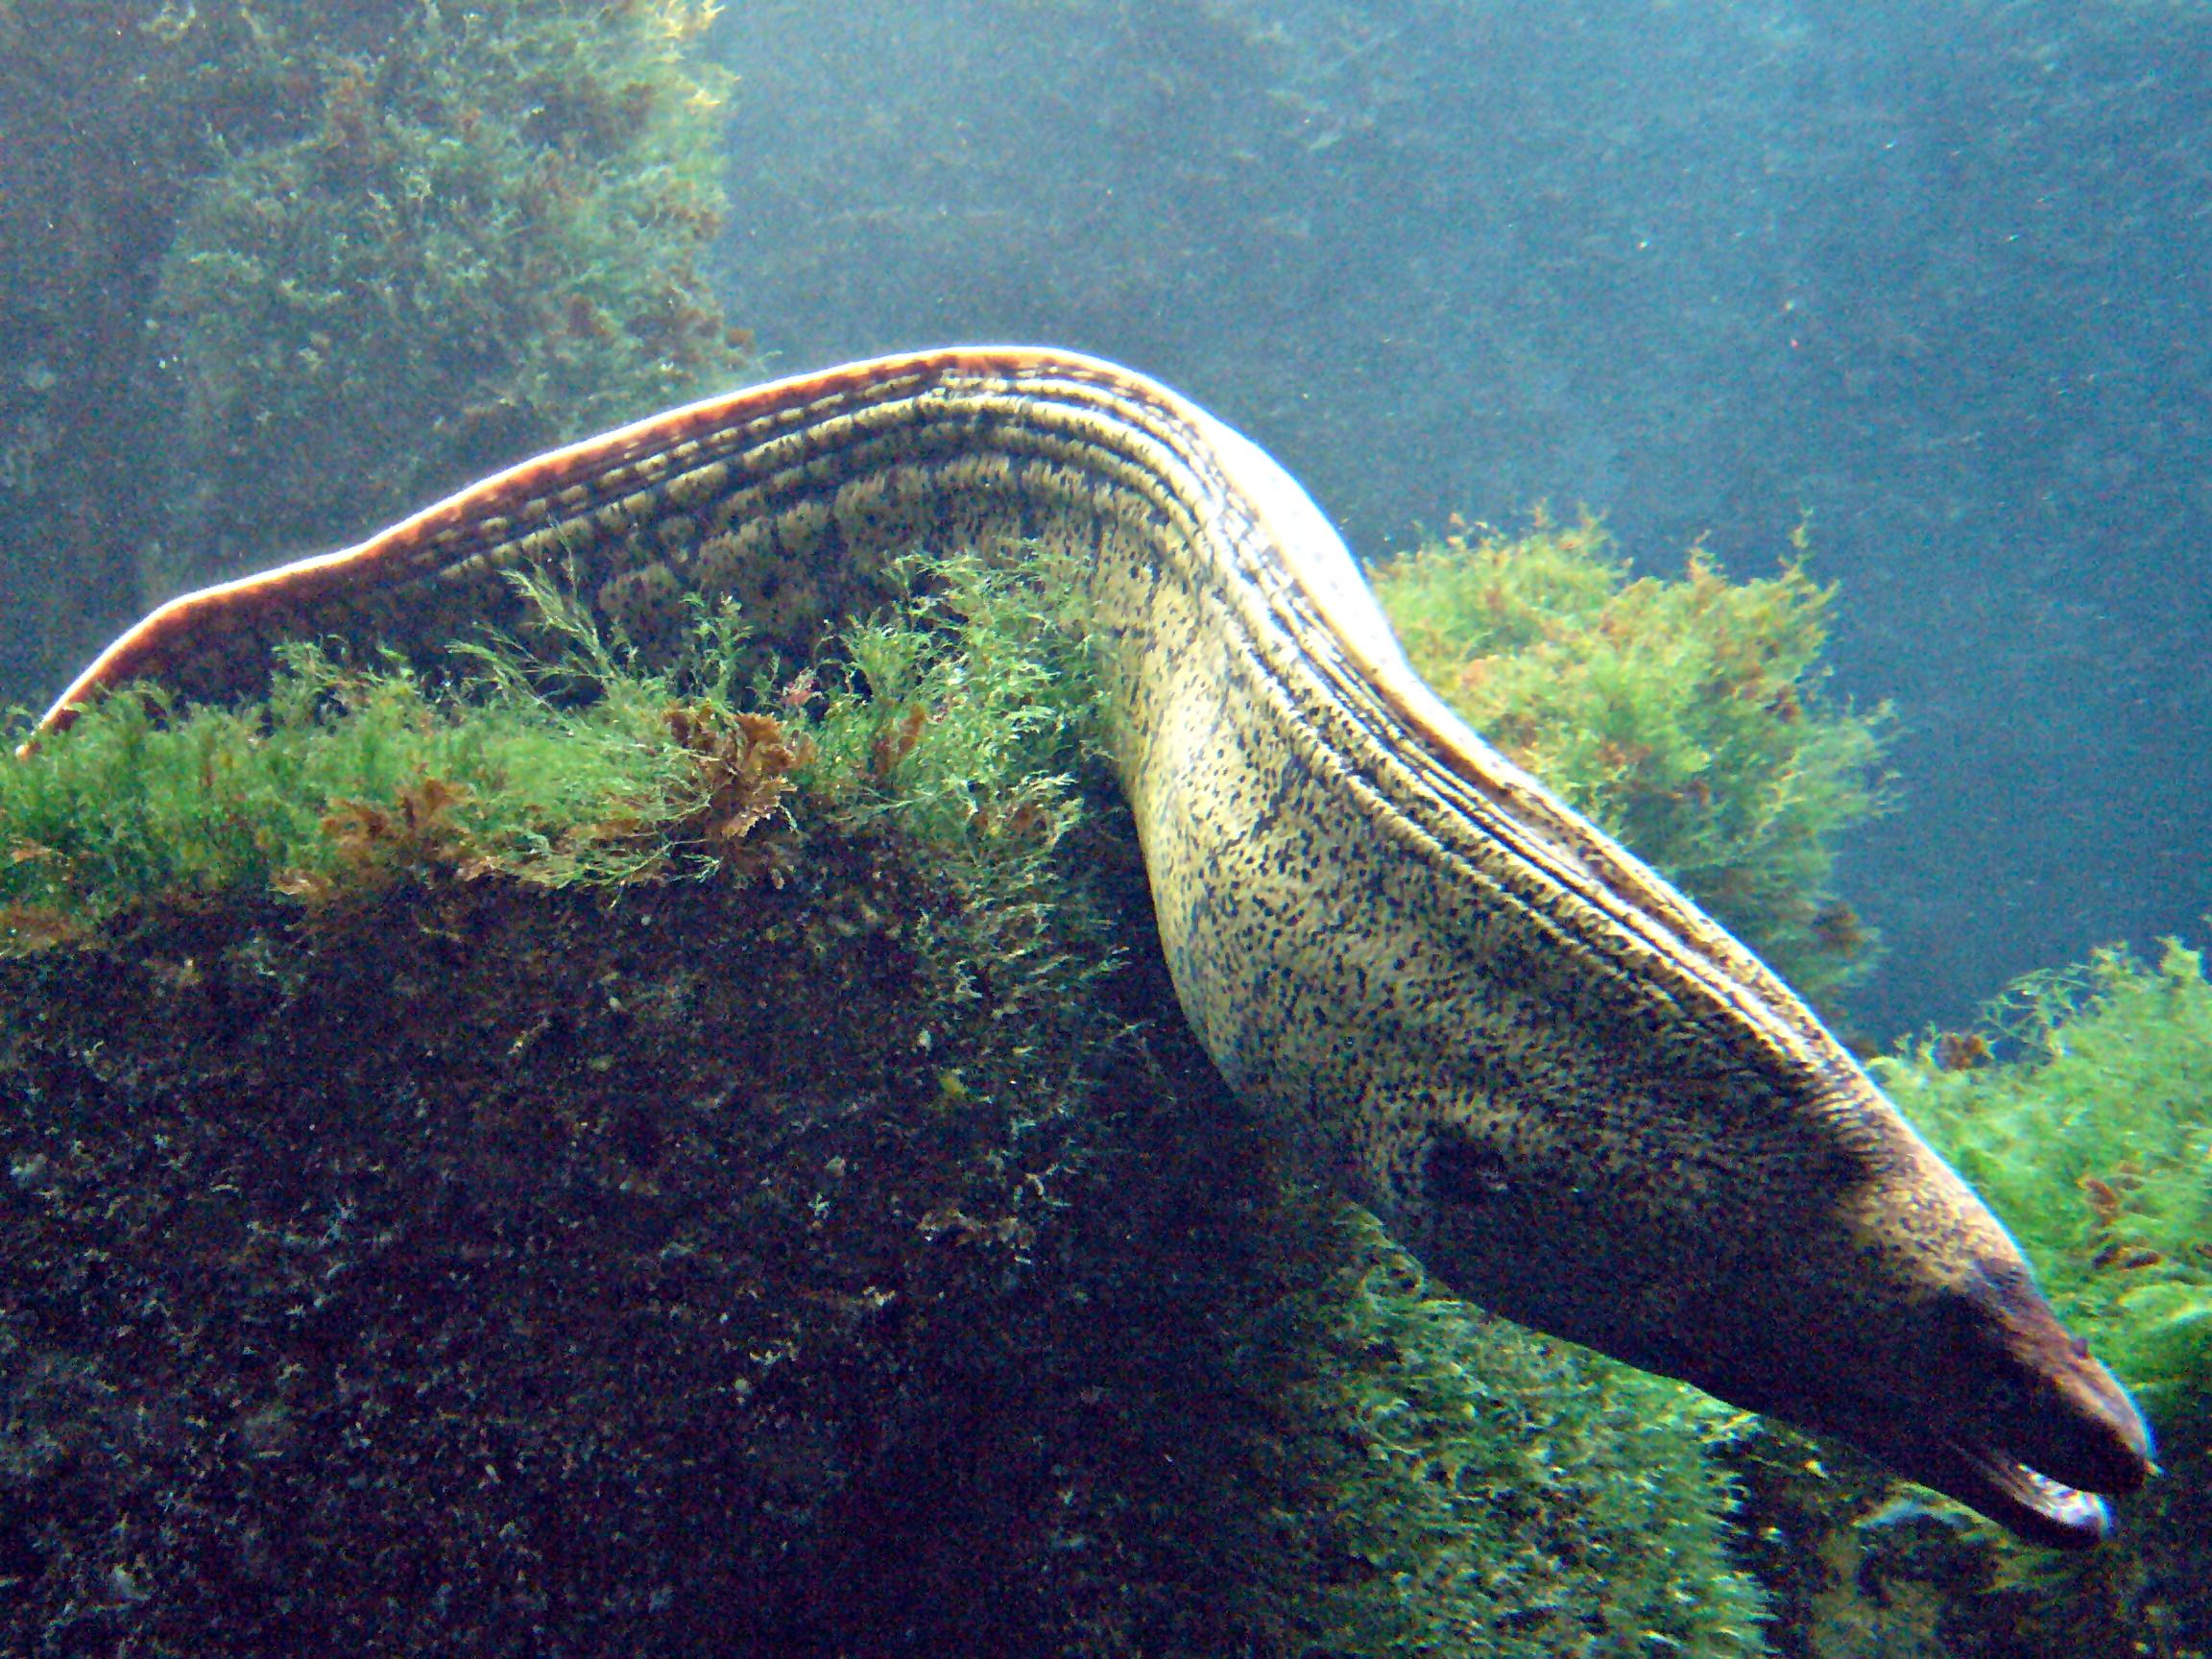 Moray Eel Size Showing Typical Moray Eel